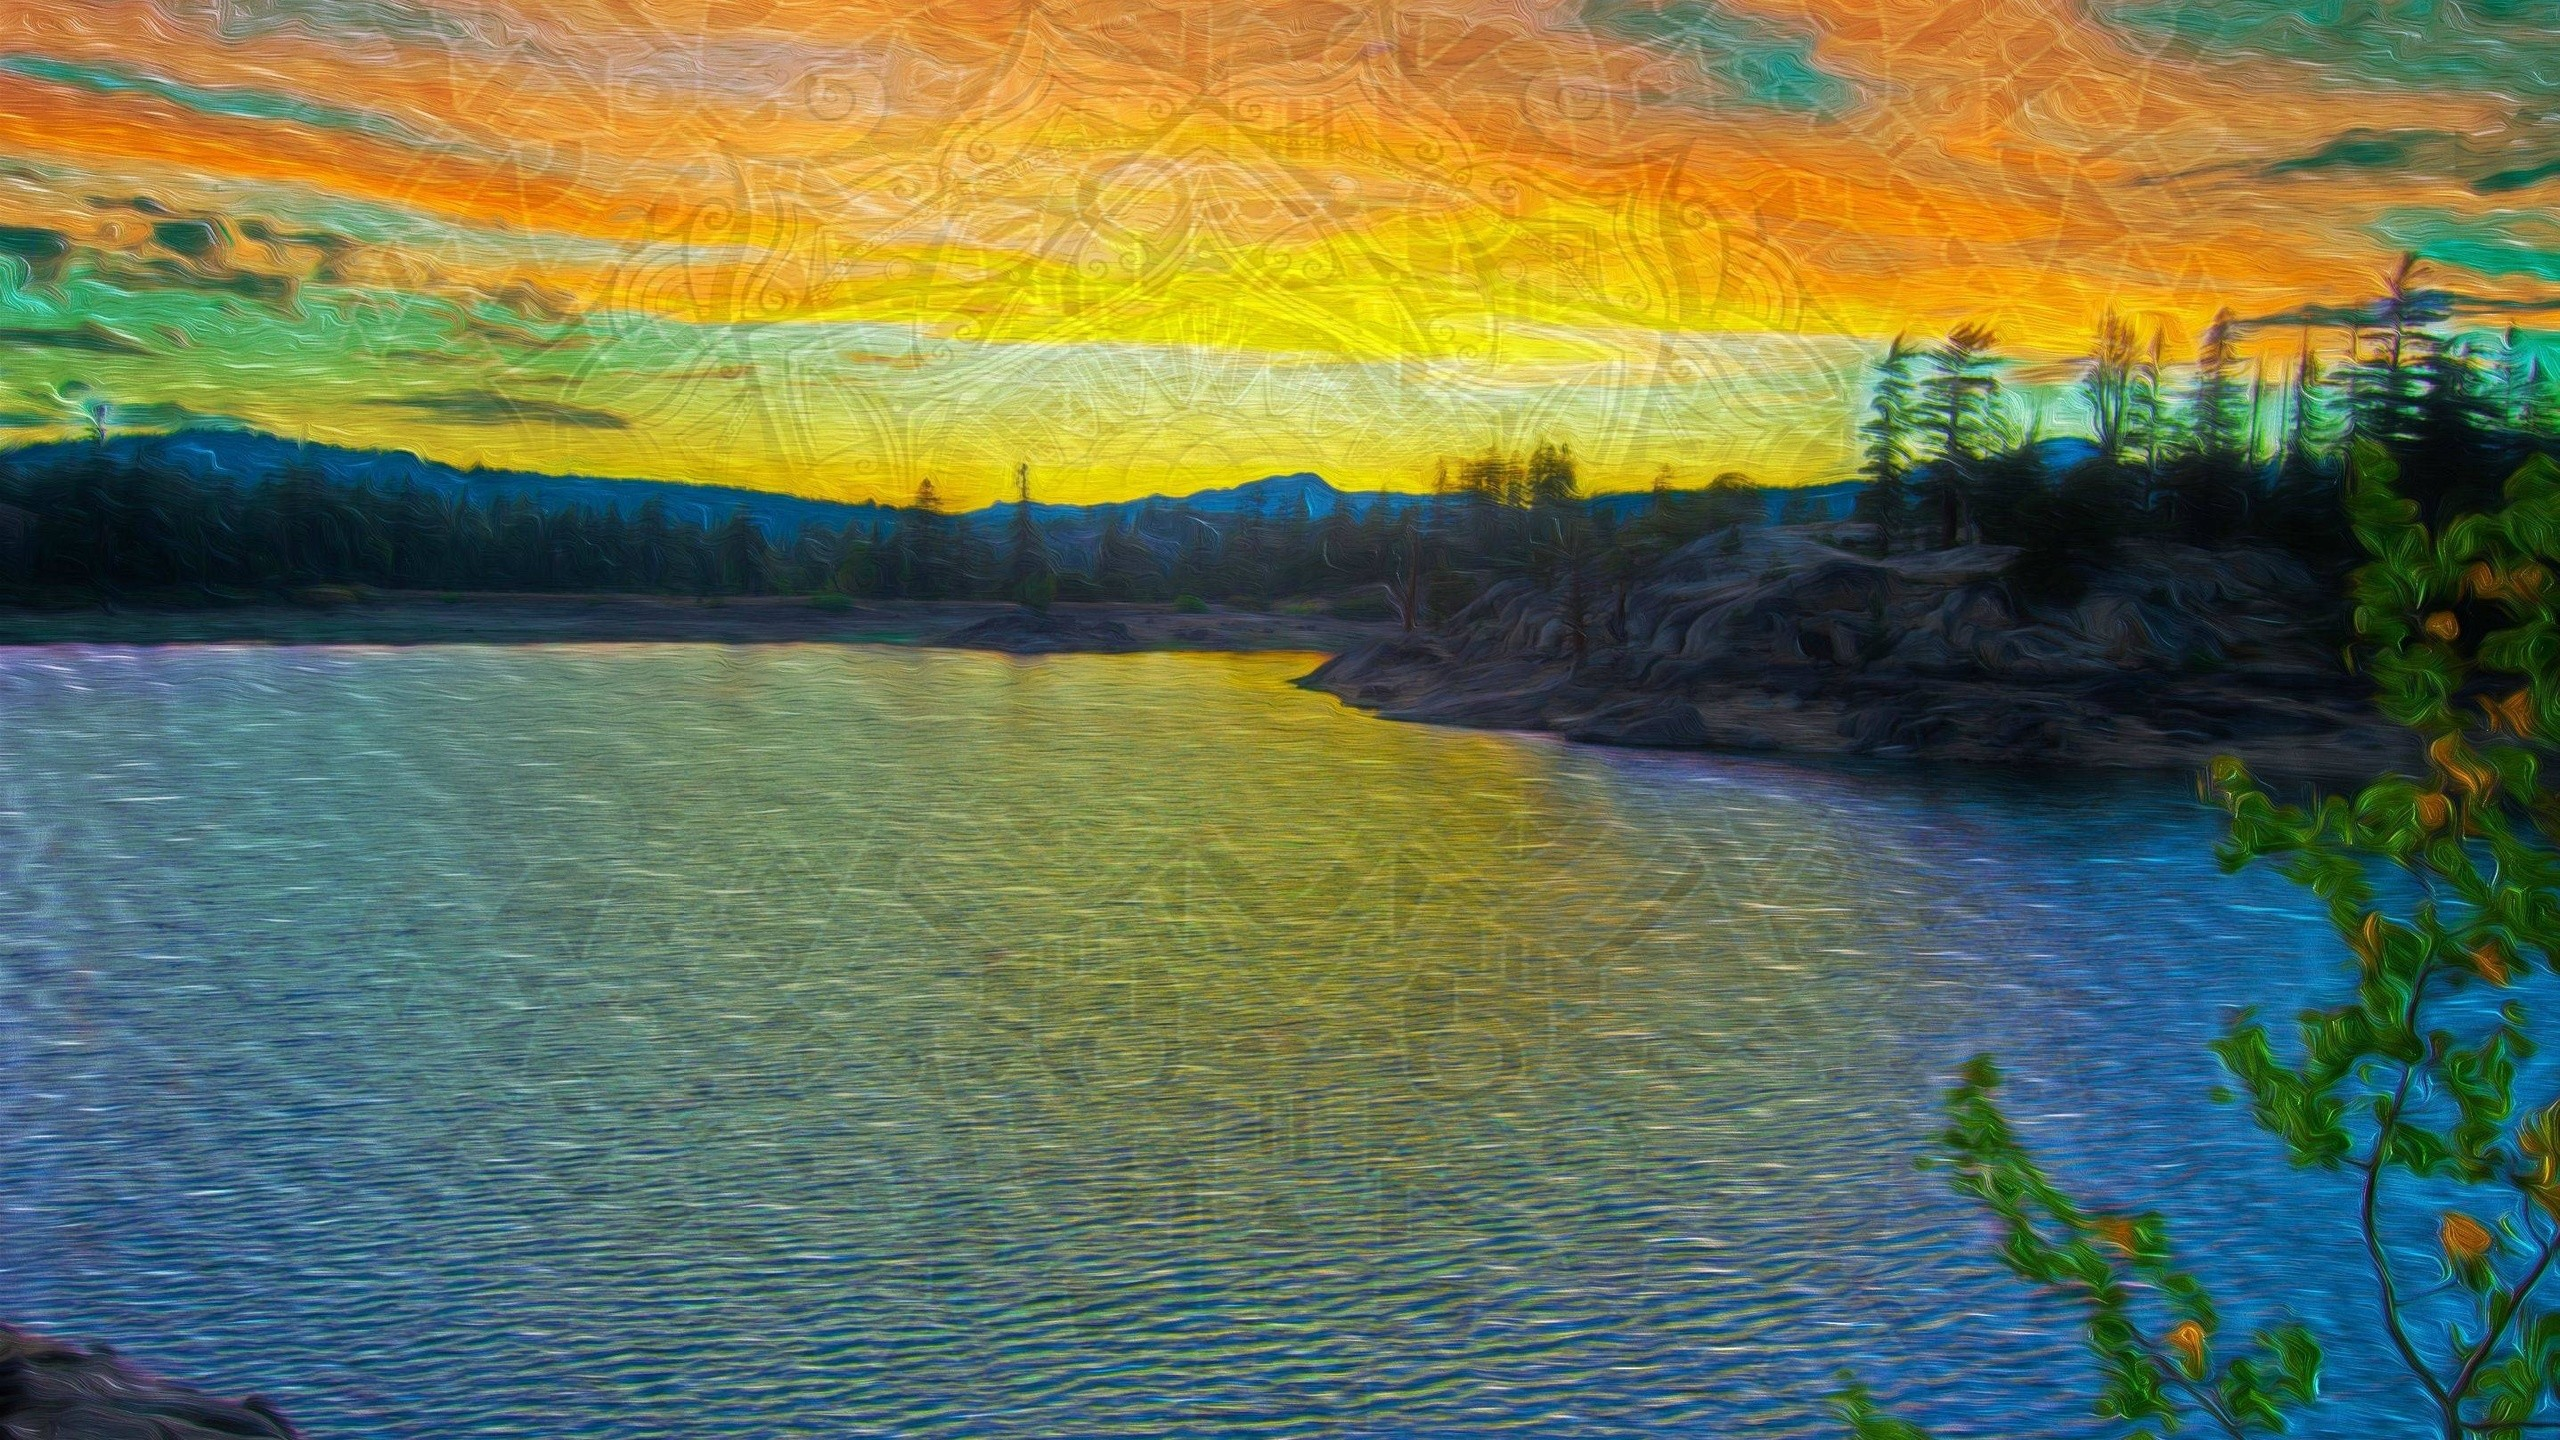 Artwork, Arts, Lsd, Summer, Landscape, Lsd Last Summer